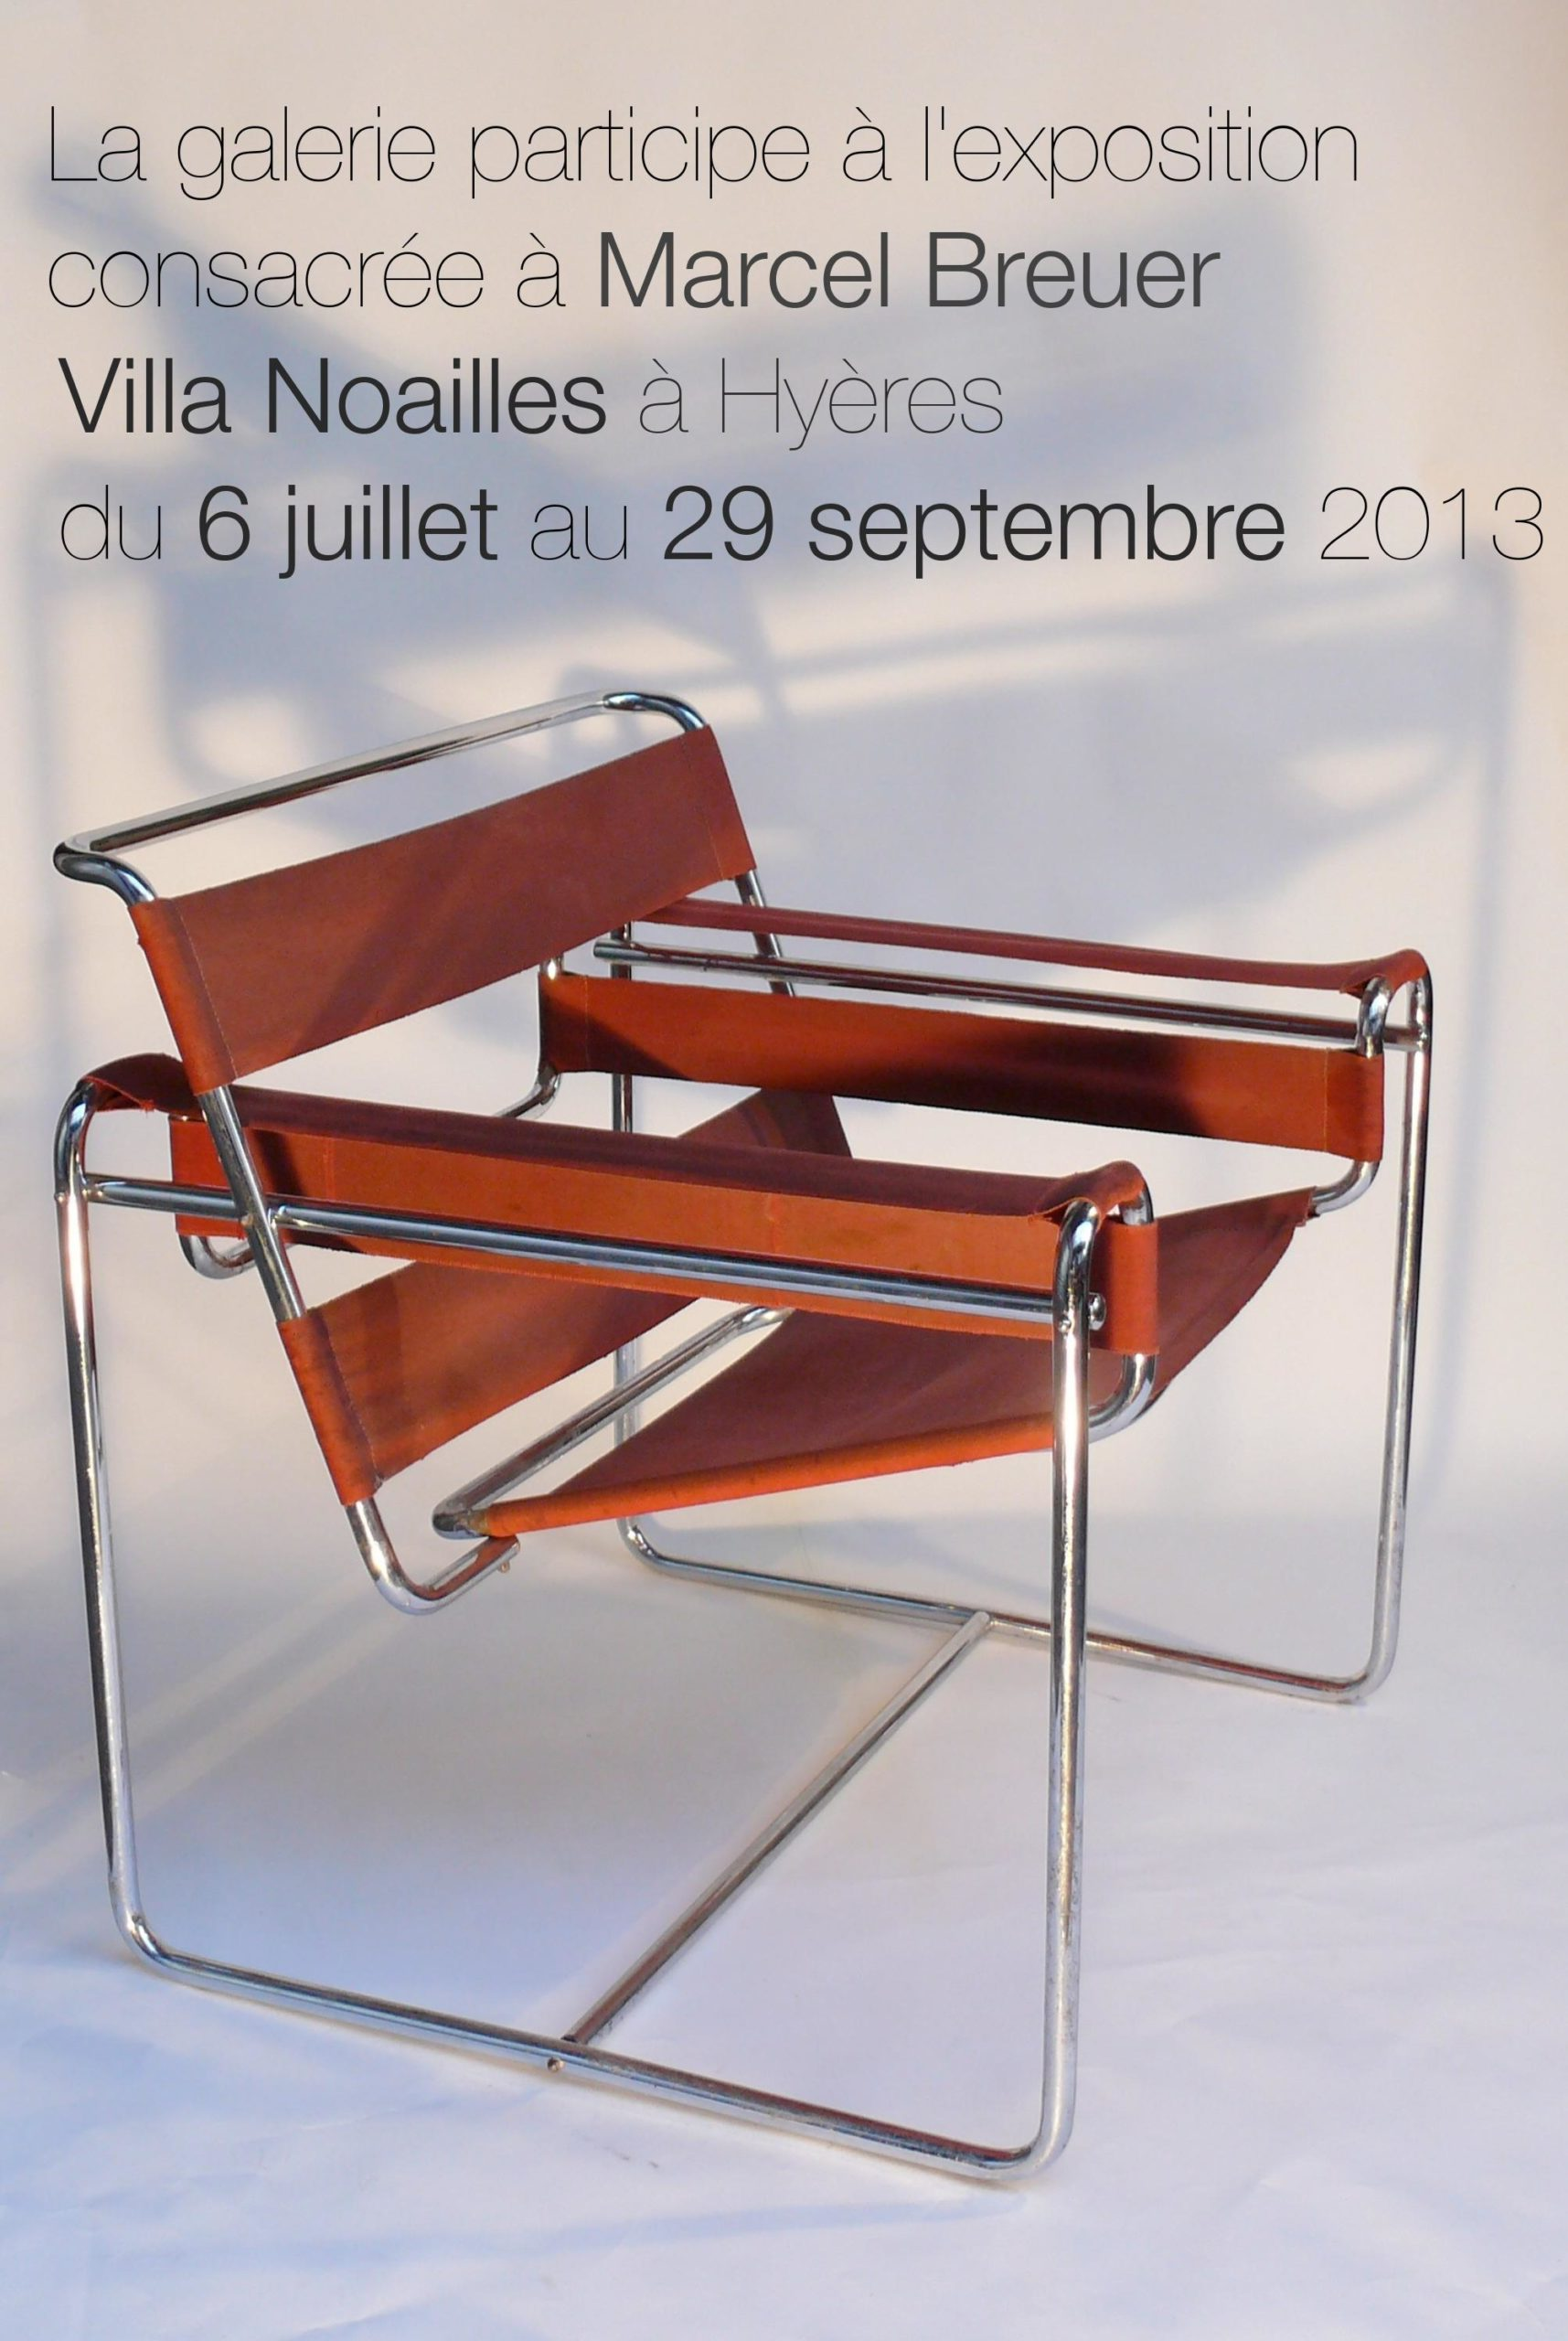 Villa-Noailles-expo-galerie-avenir